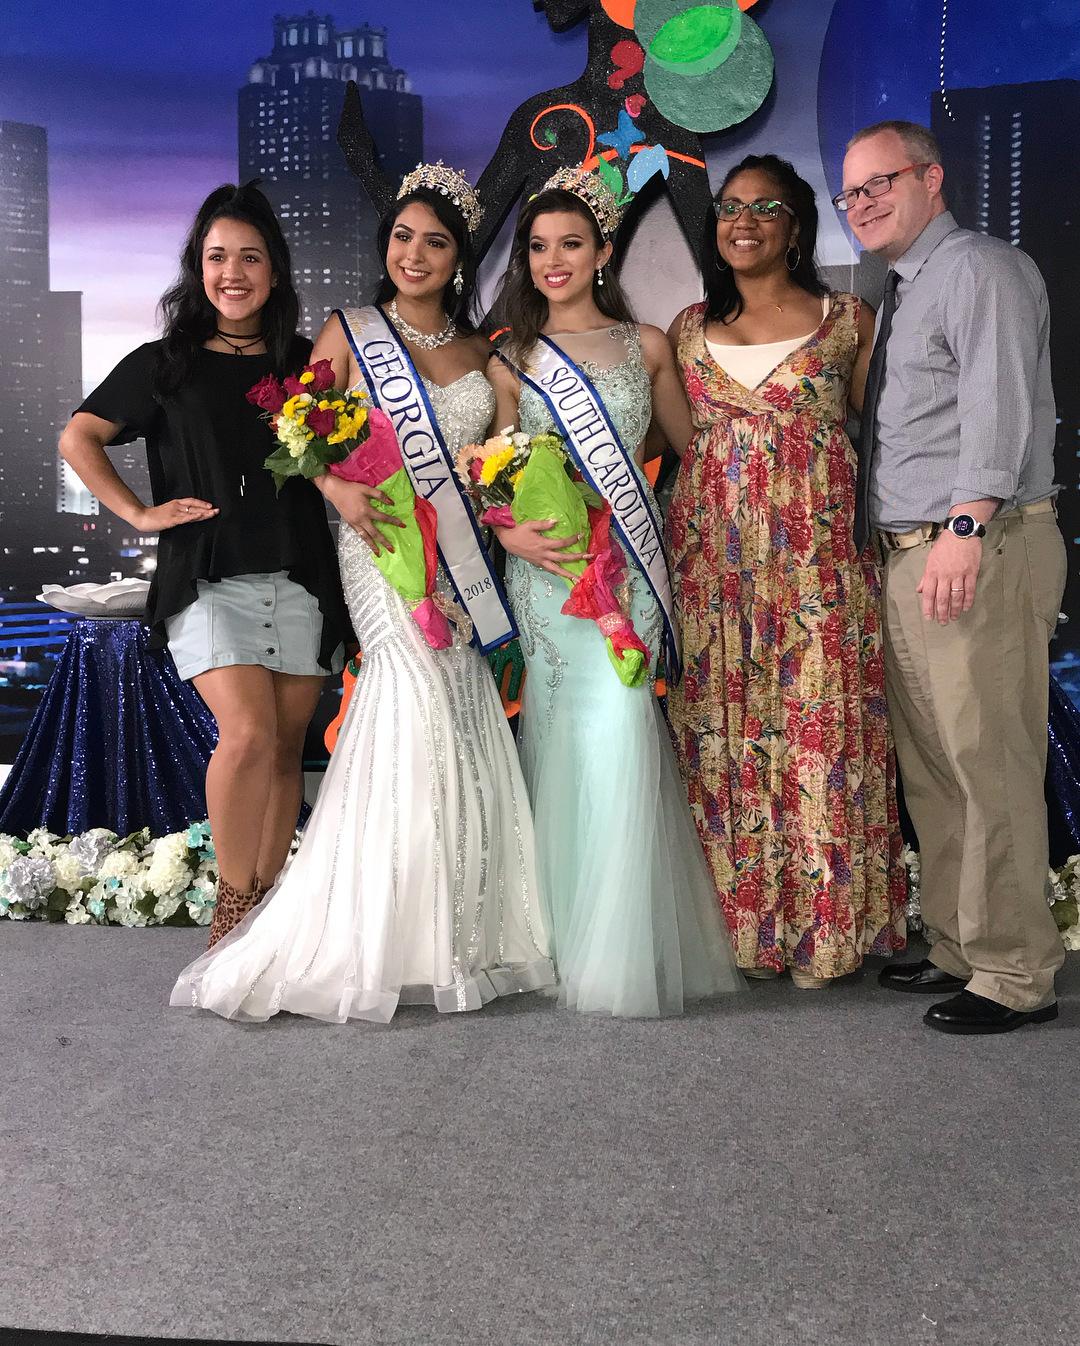 estefany frost, miss teen mundial latina usa 2019. - Página 2 34296610